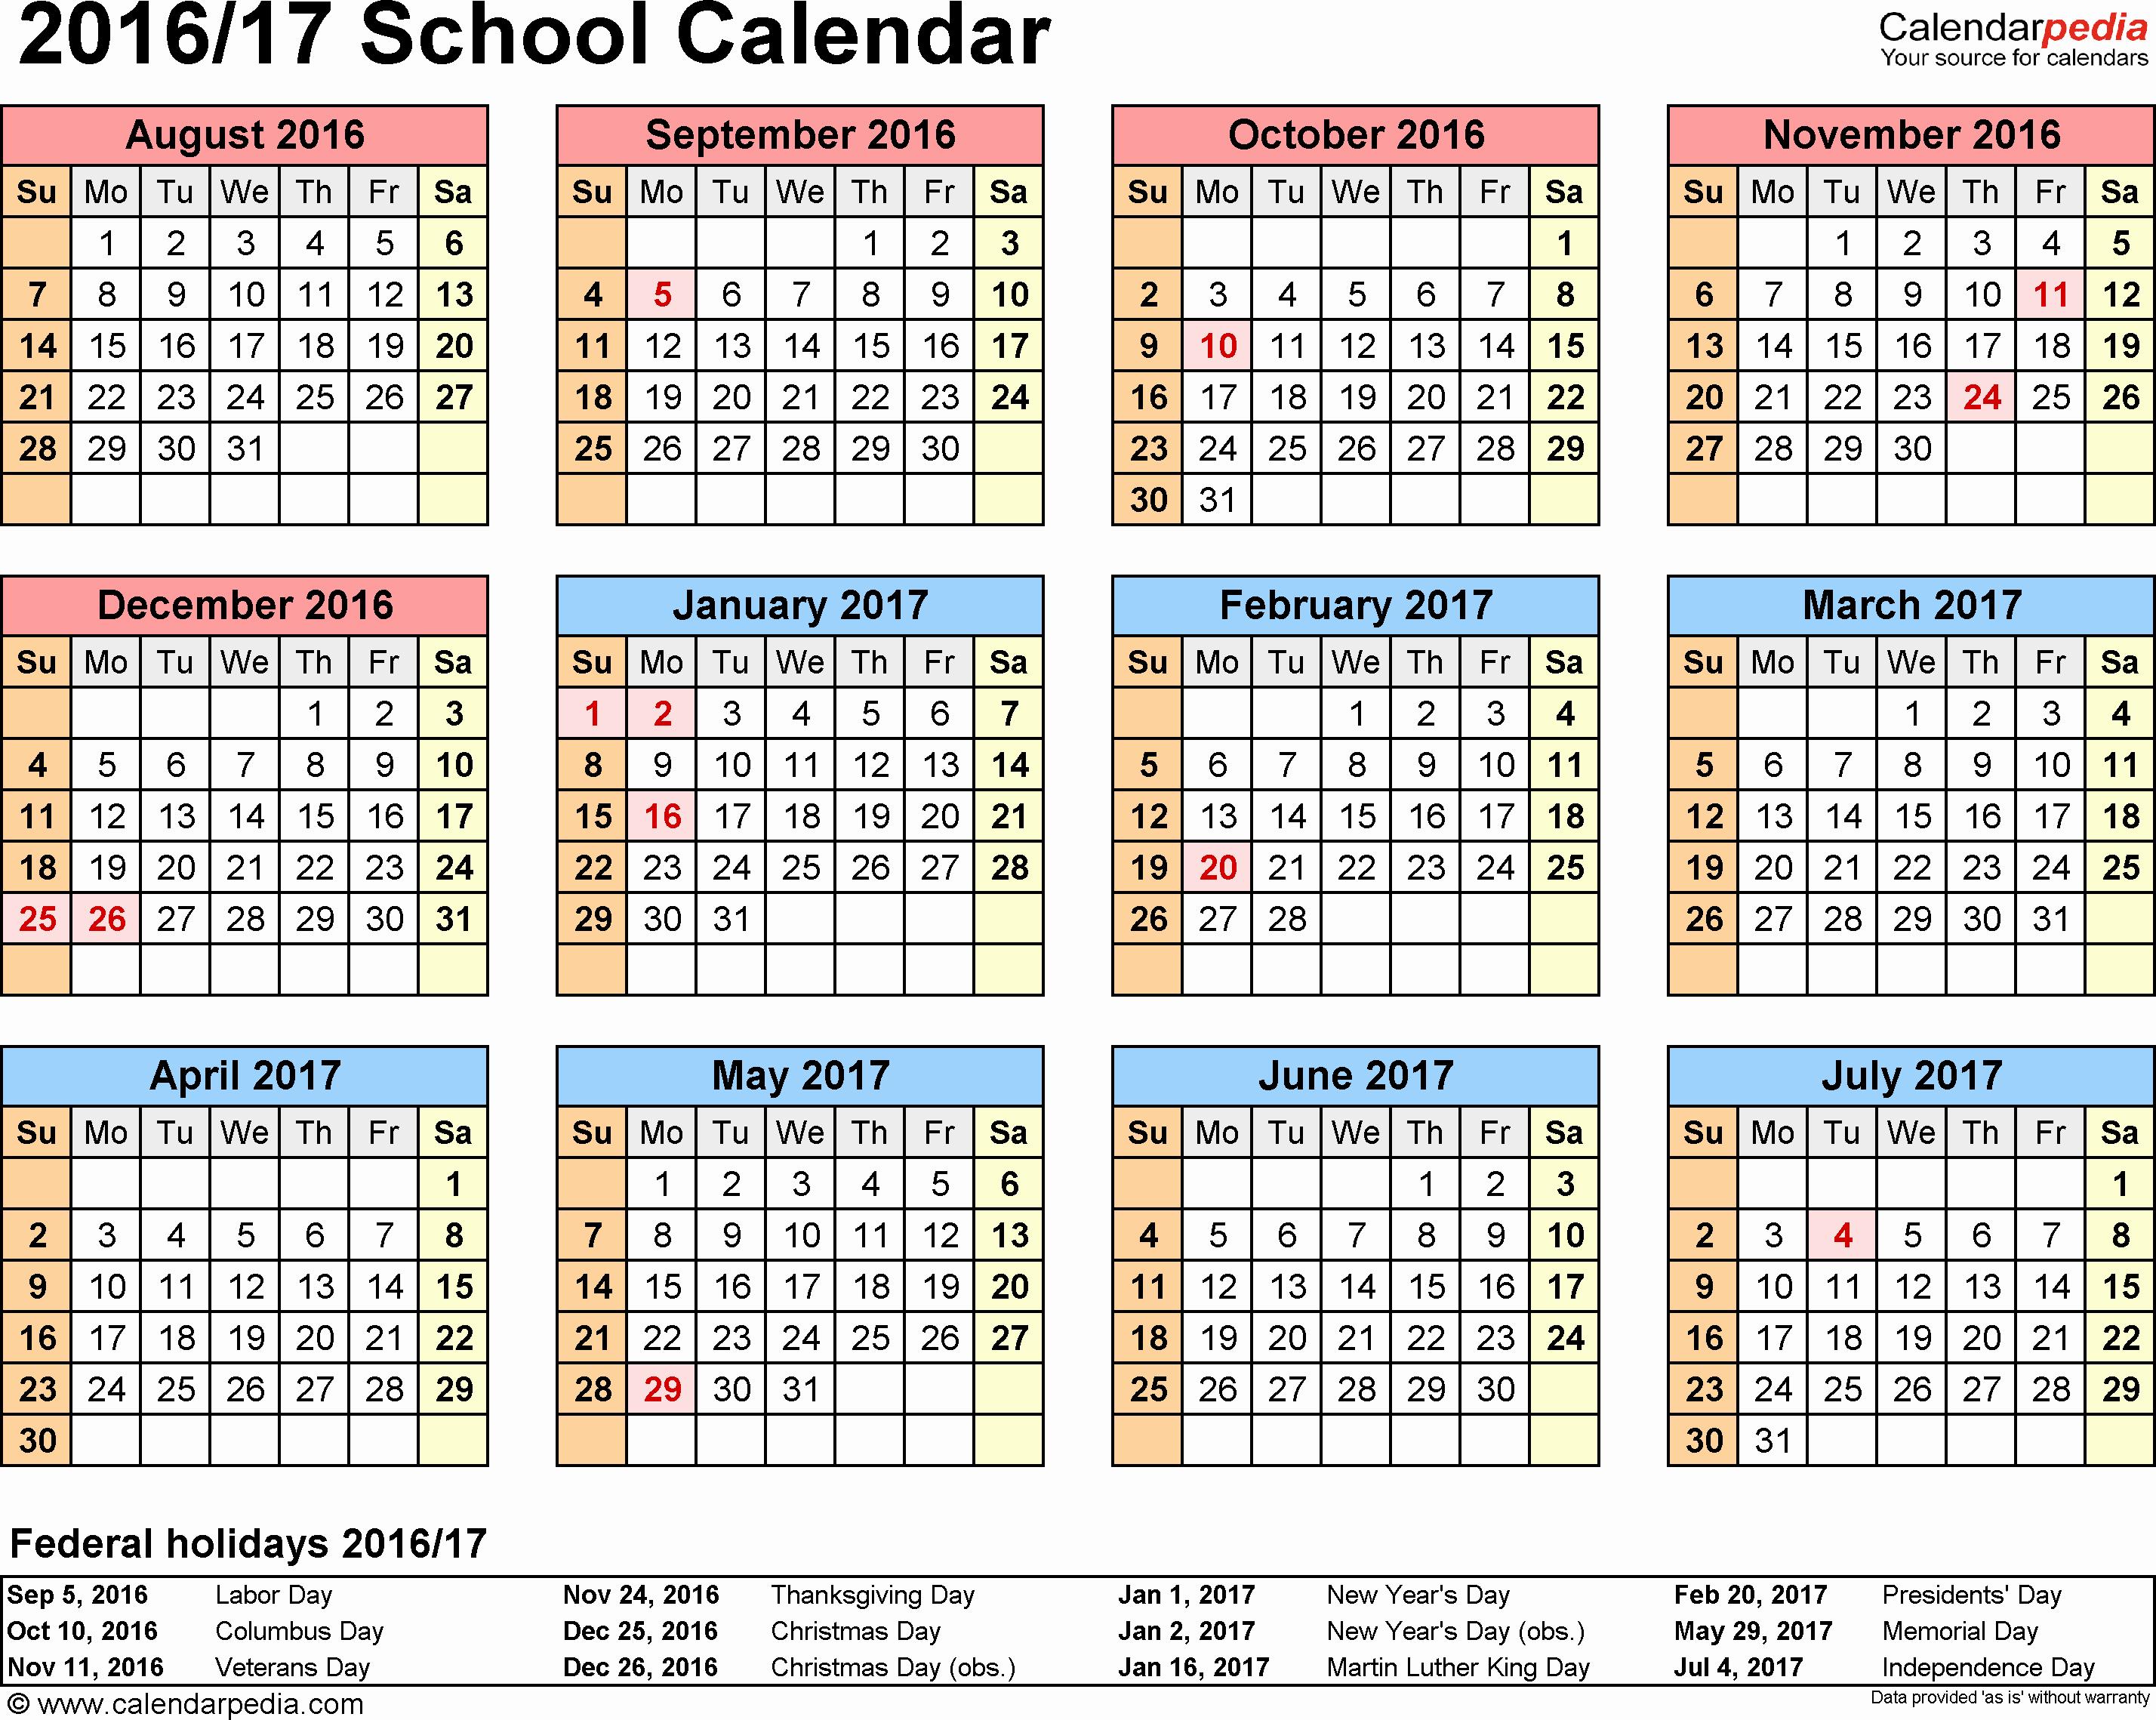 Blank Calendar 2016-17 Fresh School Calendars 2016 2017 as Free Printable Pdf Templates